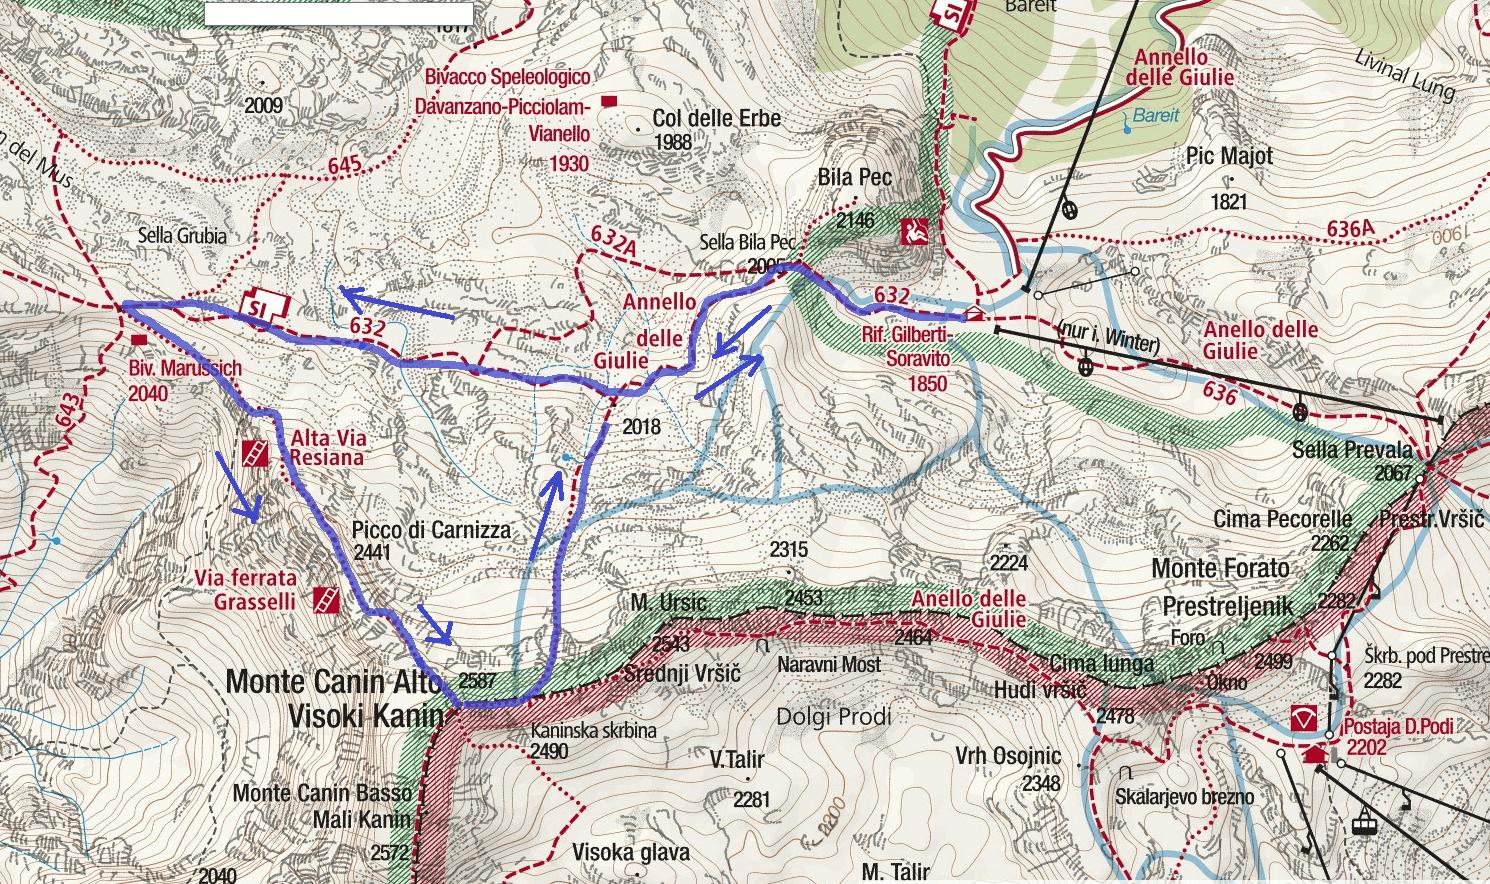 Grasselli Picco Carnina Map Canin Itinerary